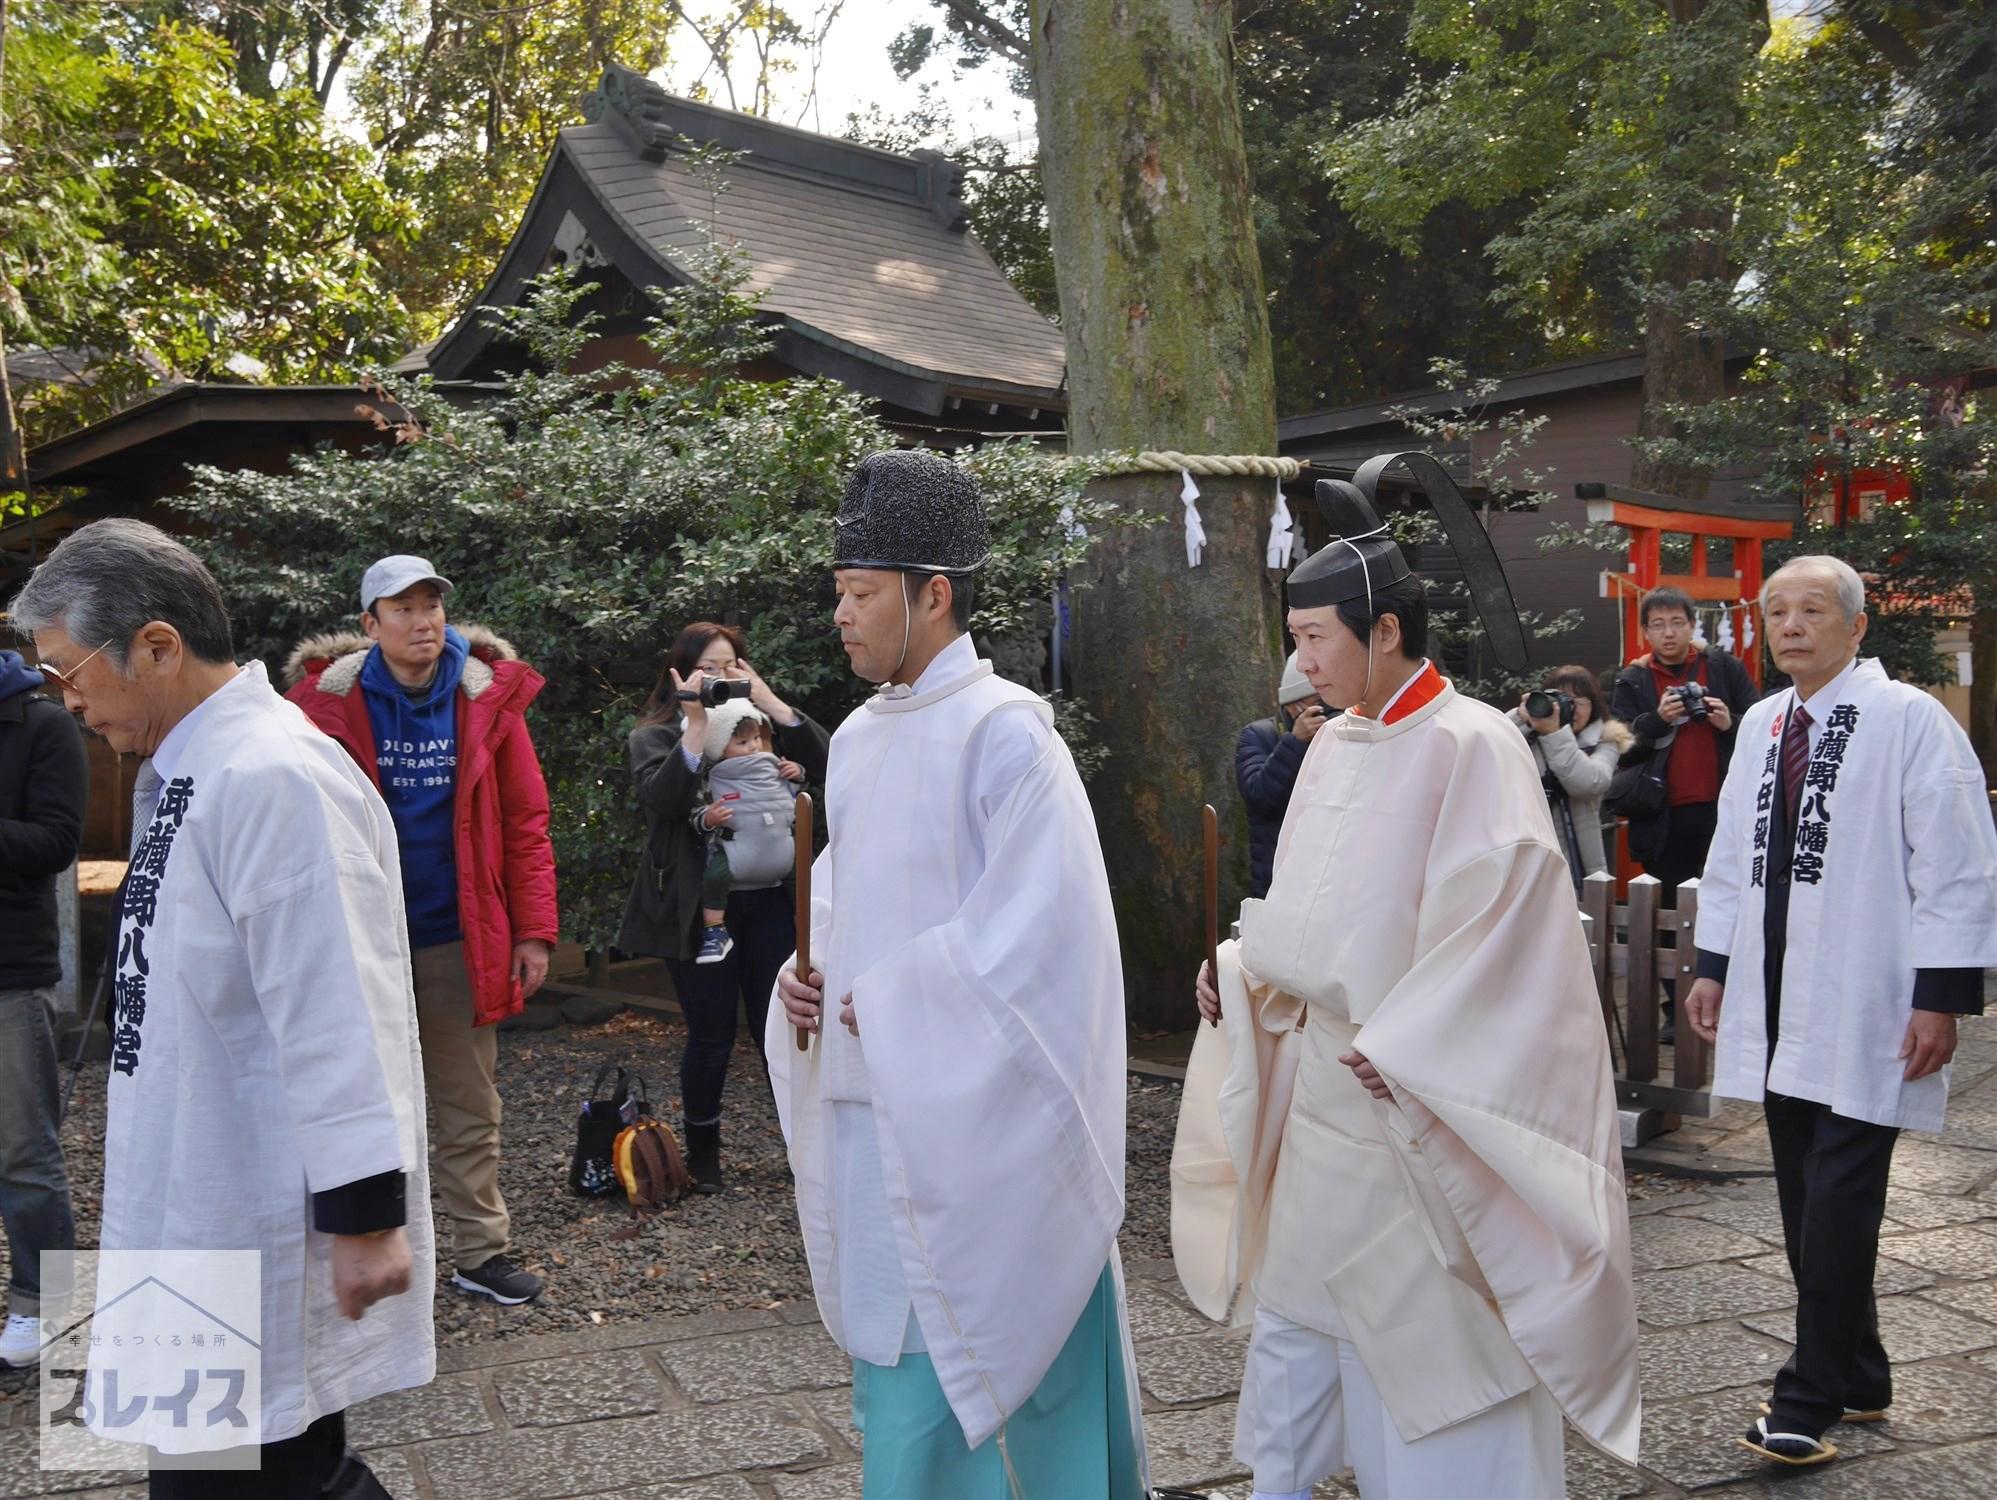 LA20190203-武蔵野八幡宮-節分祭 (6).jpg